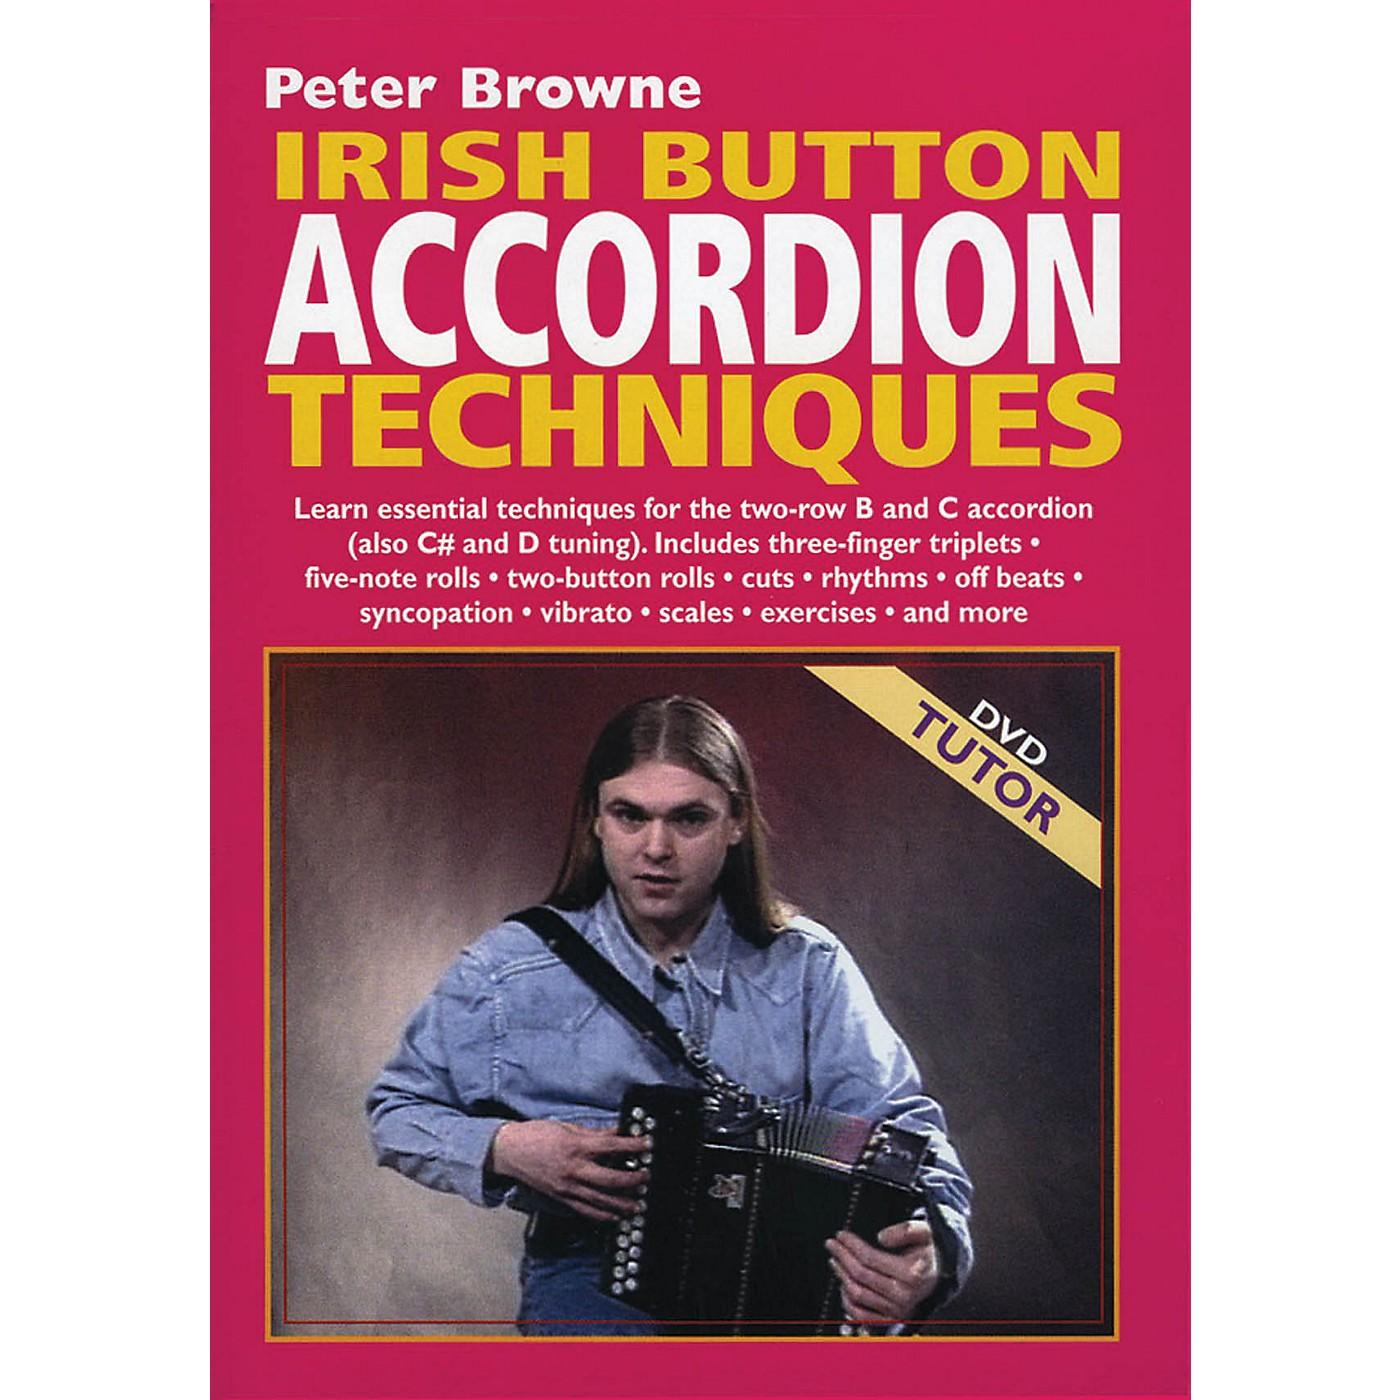 Waltons Irish Button Accordion Techniques Waltons Irish Music Dvd Series DVD Written by Peter Browne thumbnail